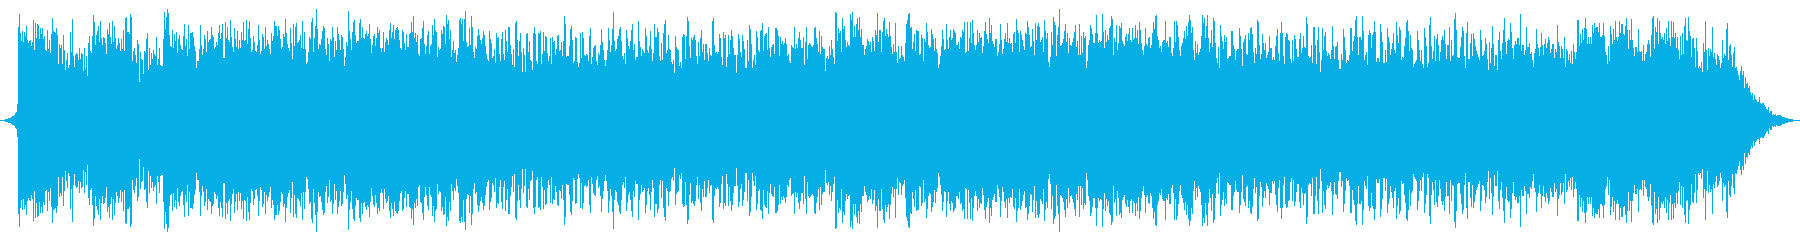 RPGや映画に合うオーケストラ風BGMの再生済みの波形